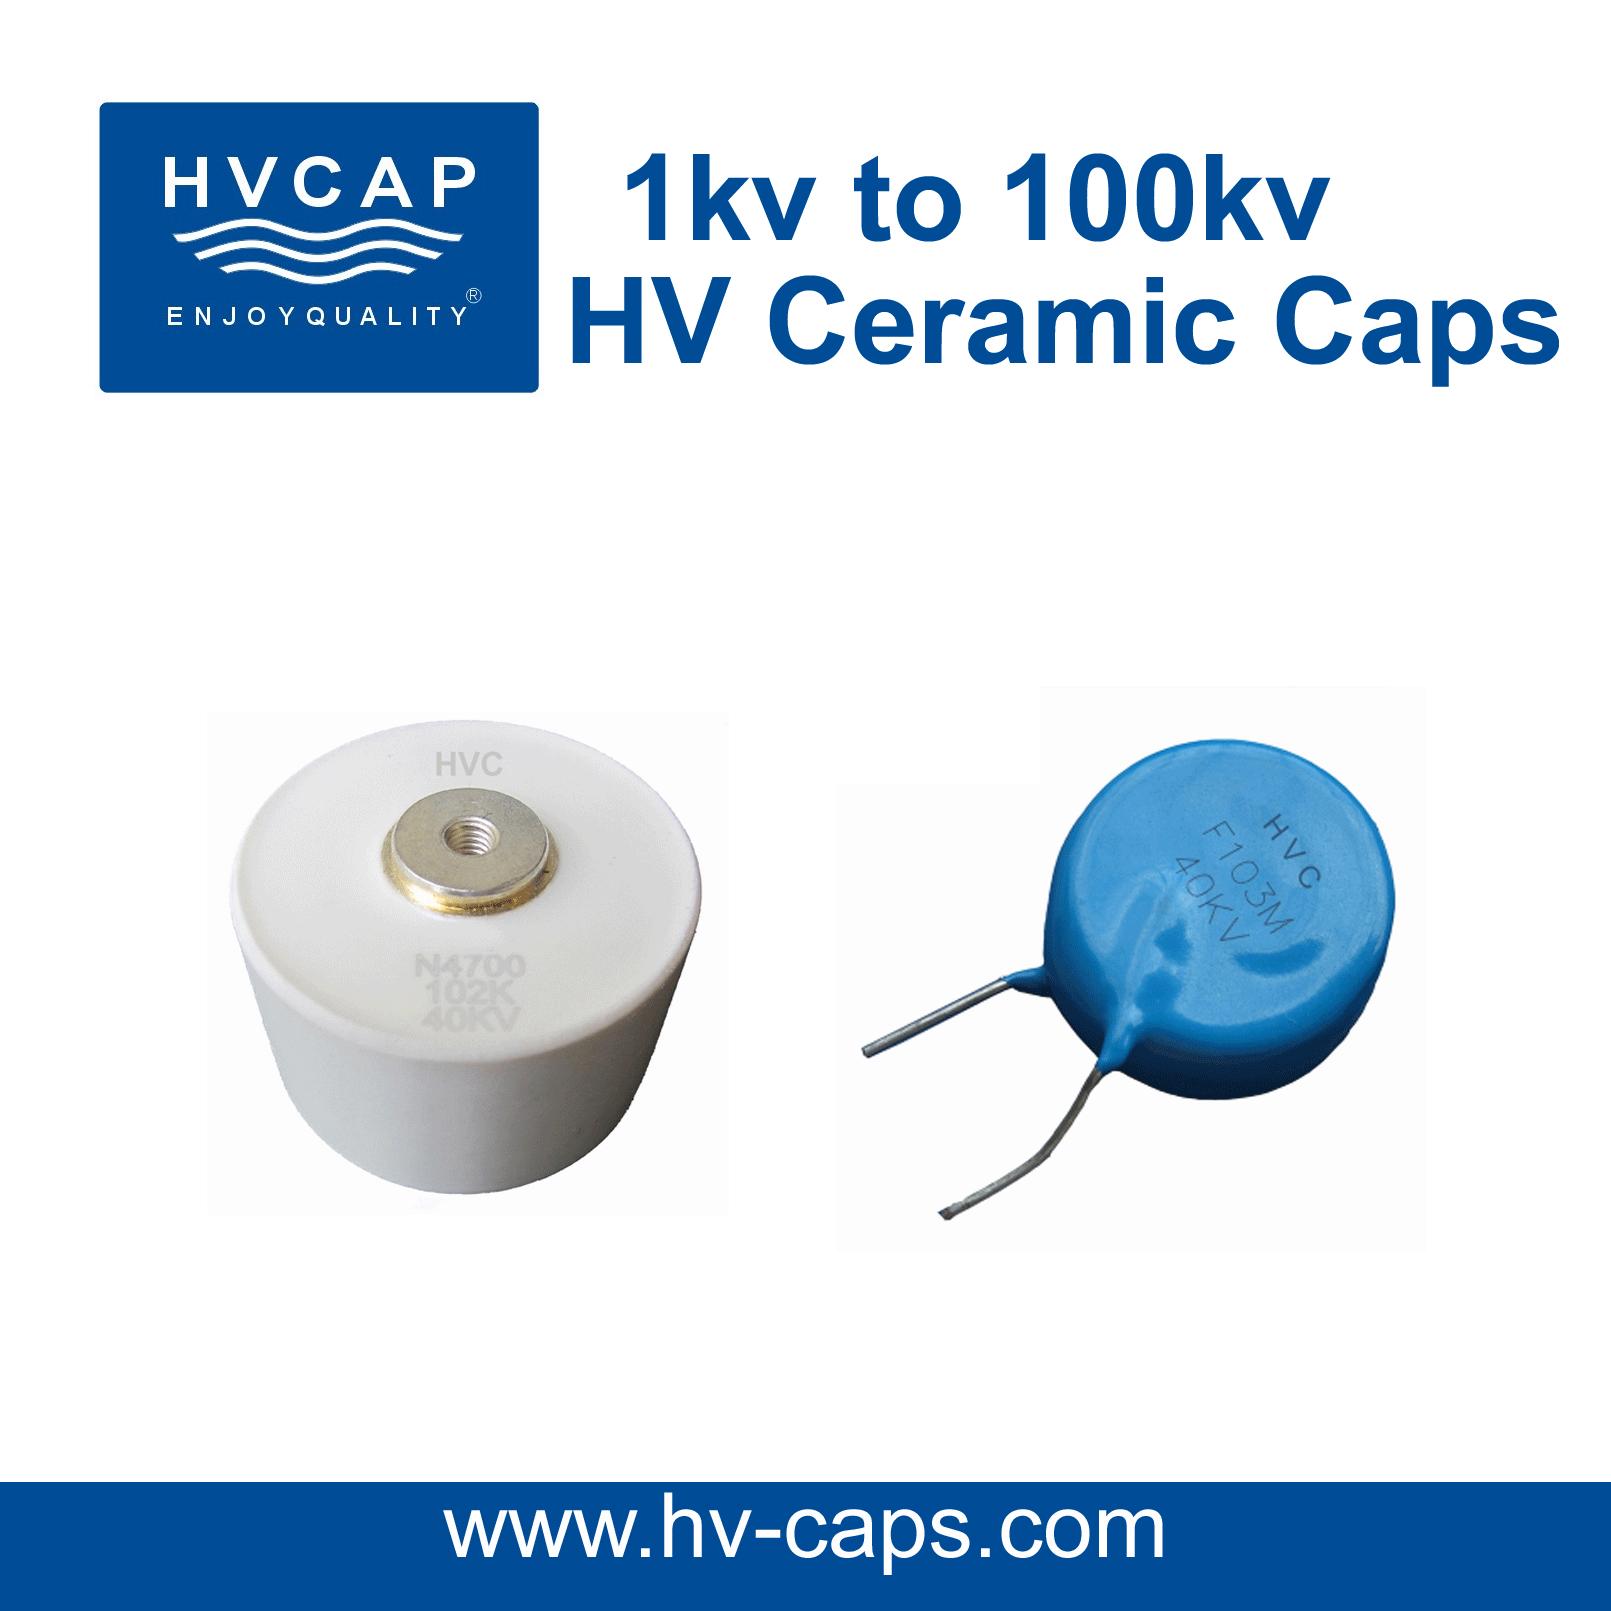 HV সিরামিক ক্যাপাসিটরের 1kv থেকে 100kv, বিস্তারিত স্পেসিফিকেশন।